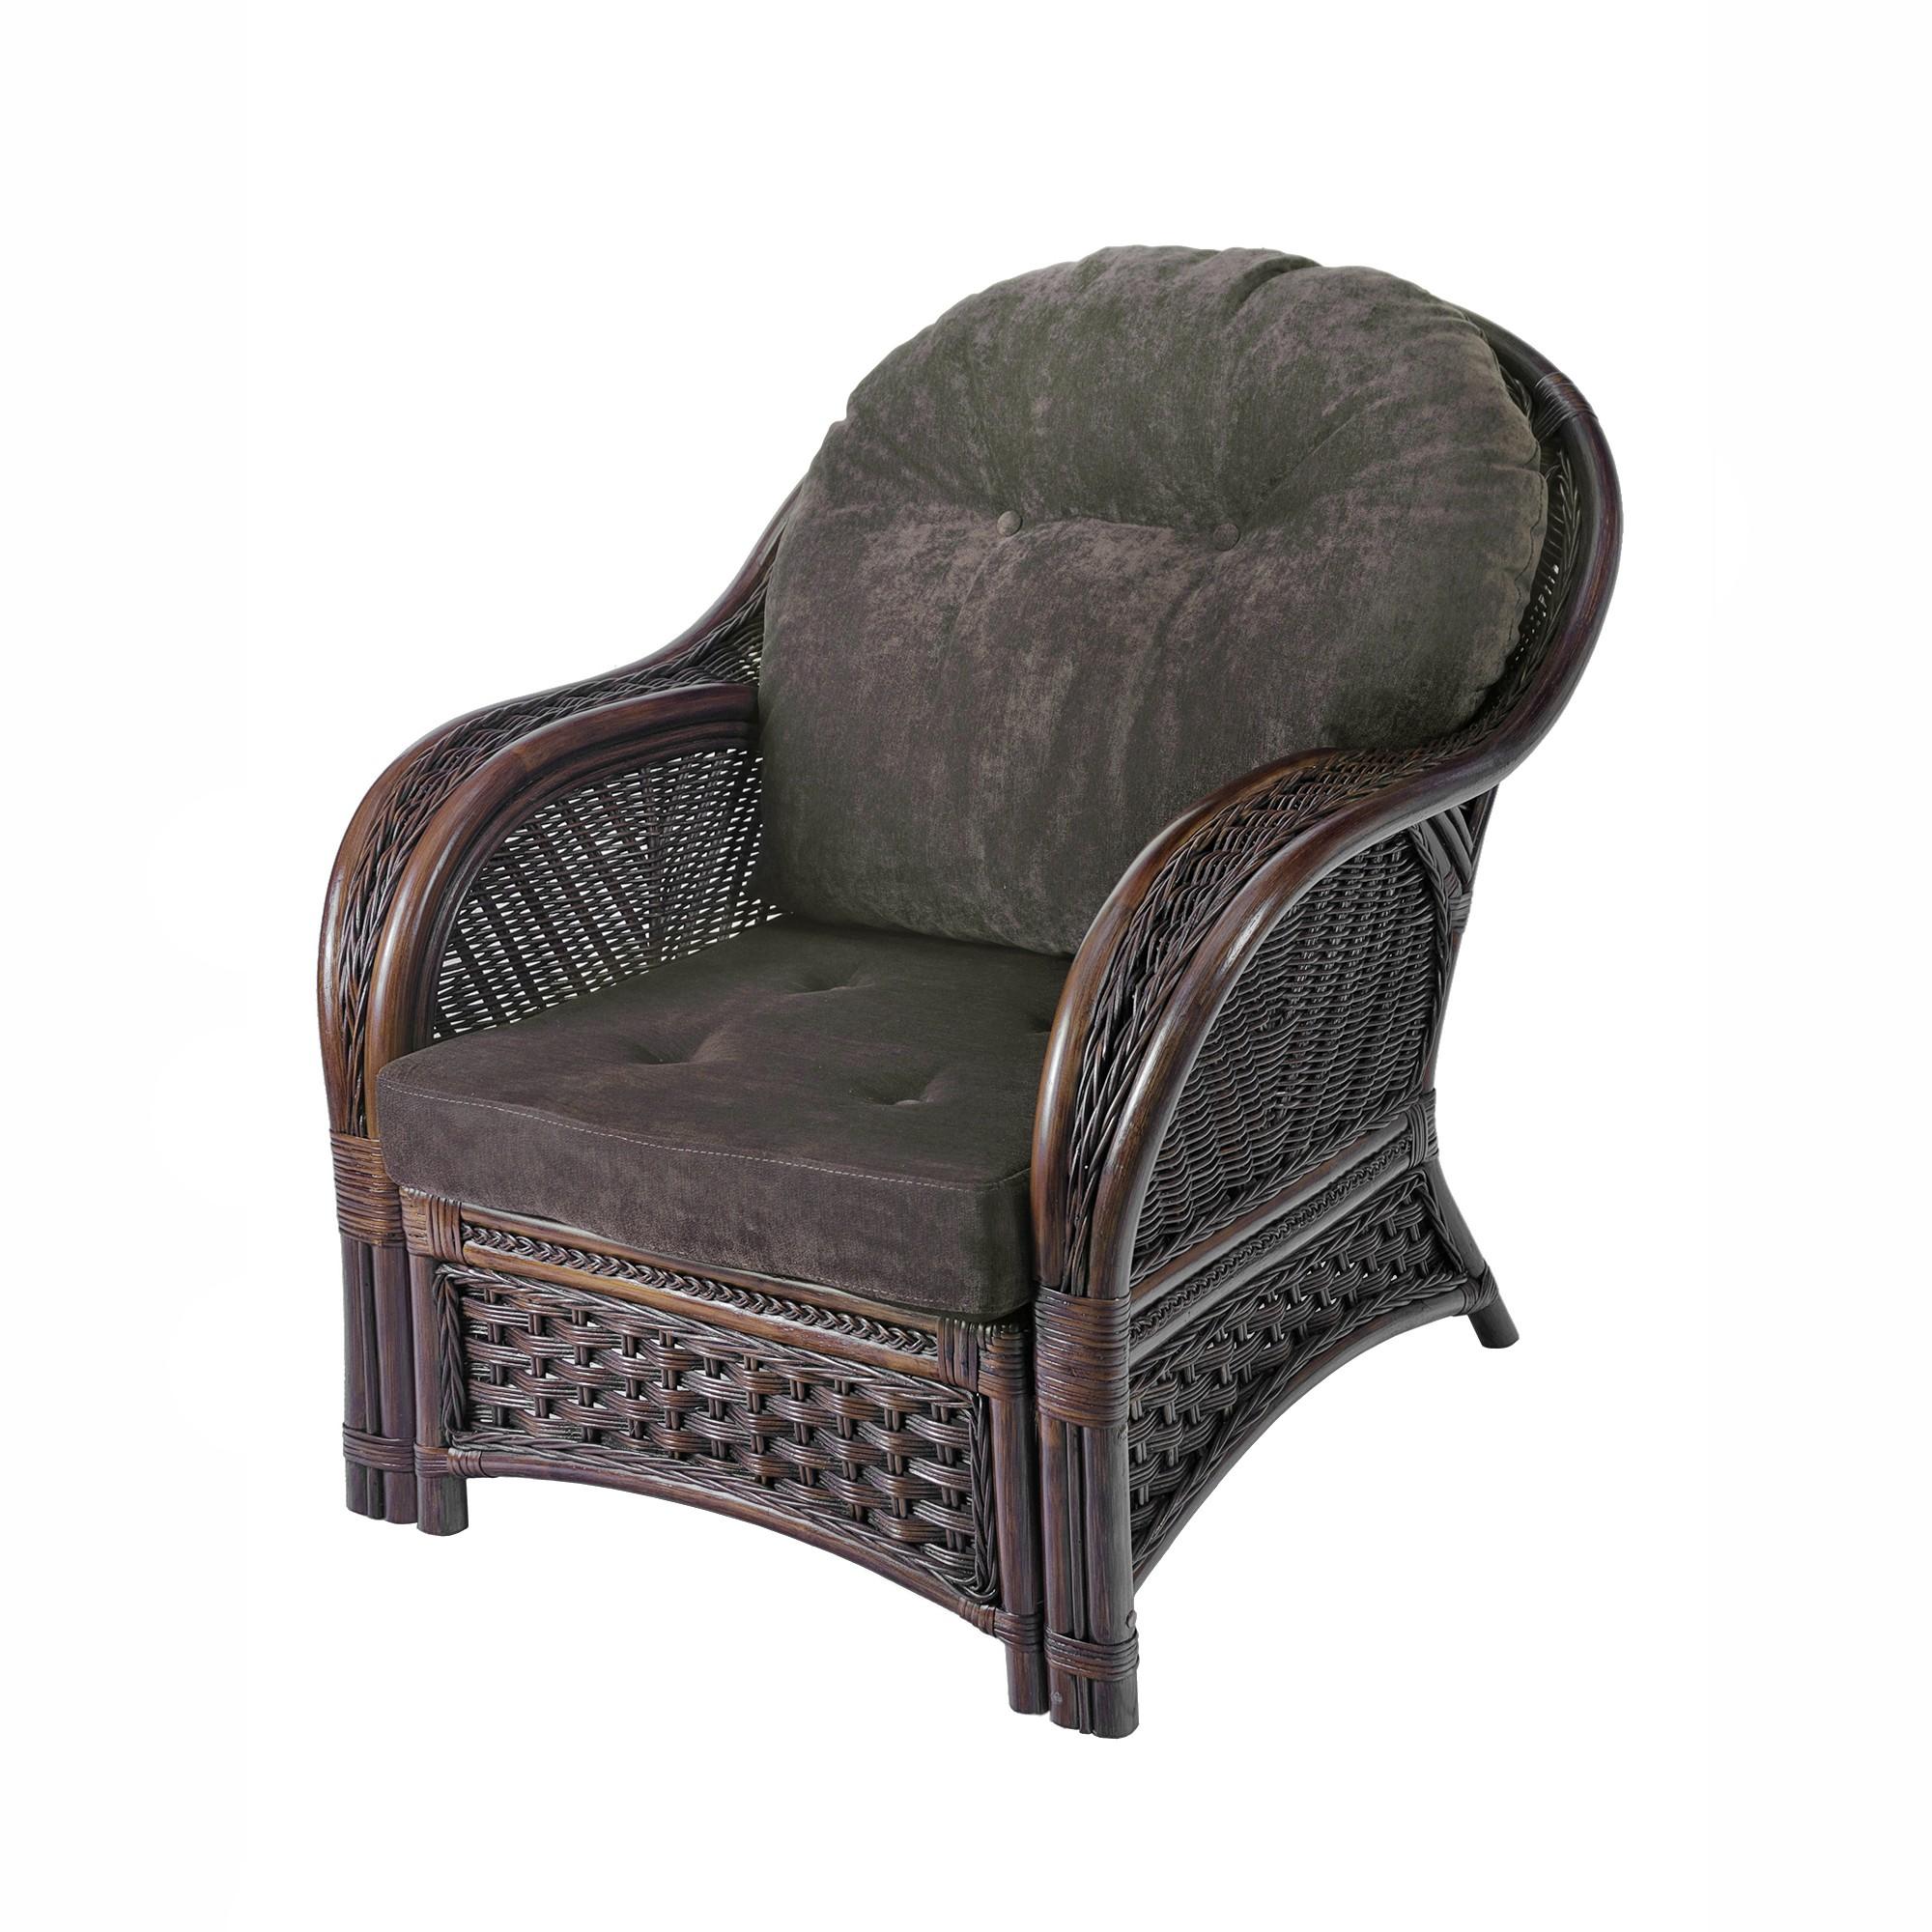 Fotel rattanowy Alhambra  rattan naturalny- RattaNeo - fotel 9/a/f